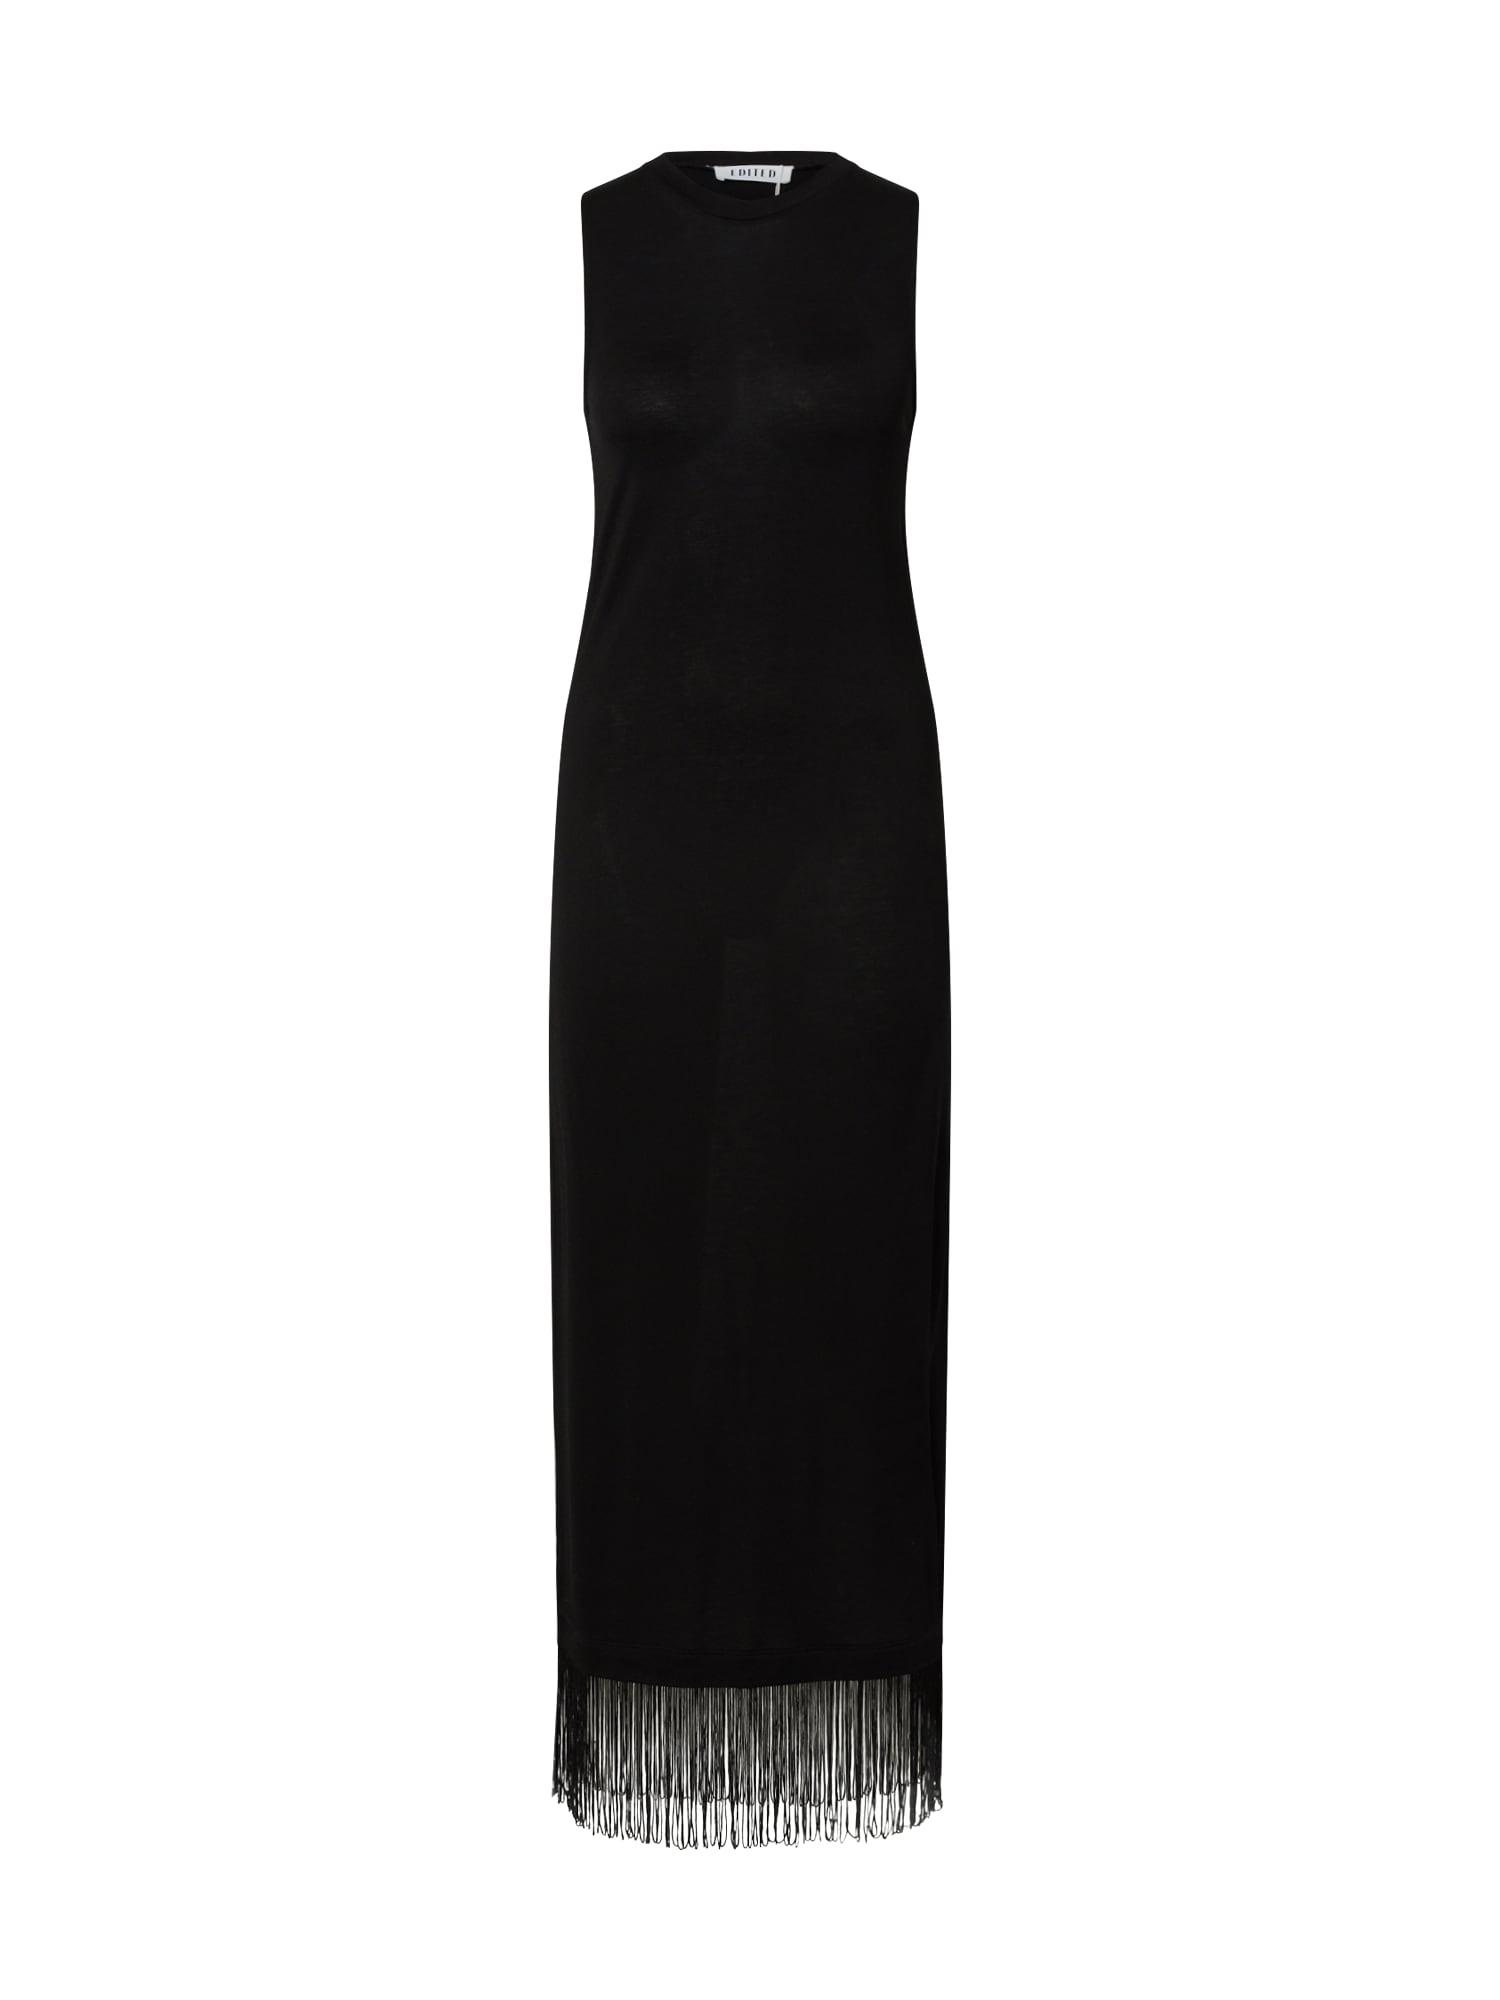 EDITED Suknelė 'Edwin' juoda